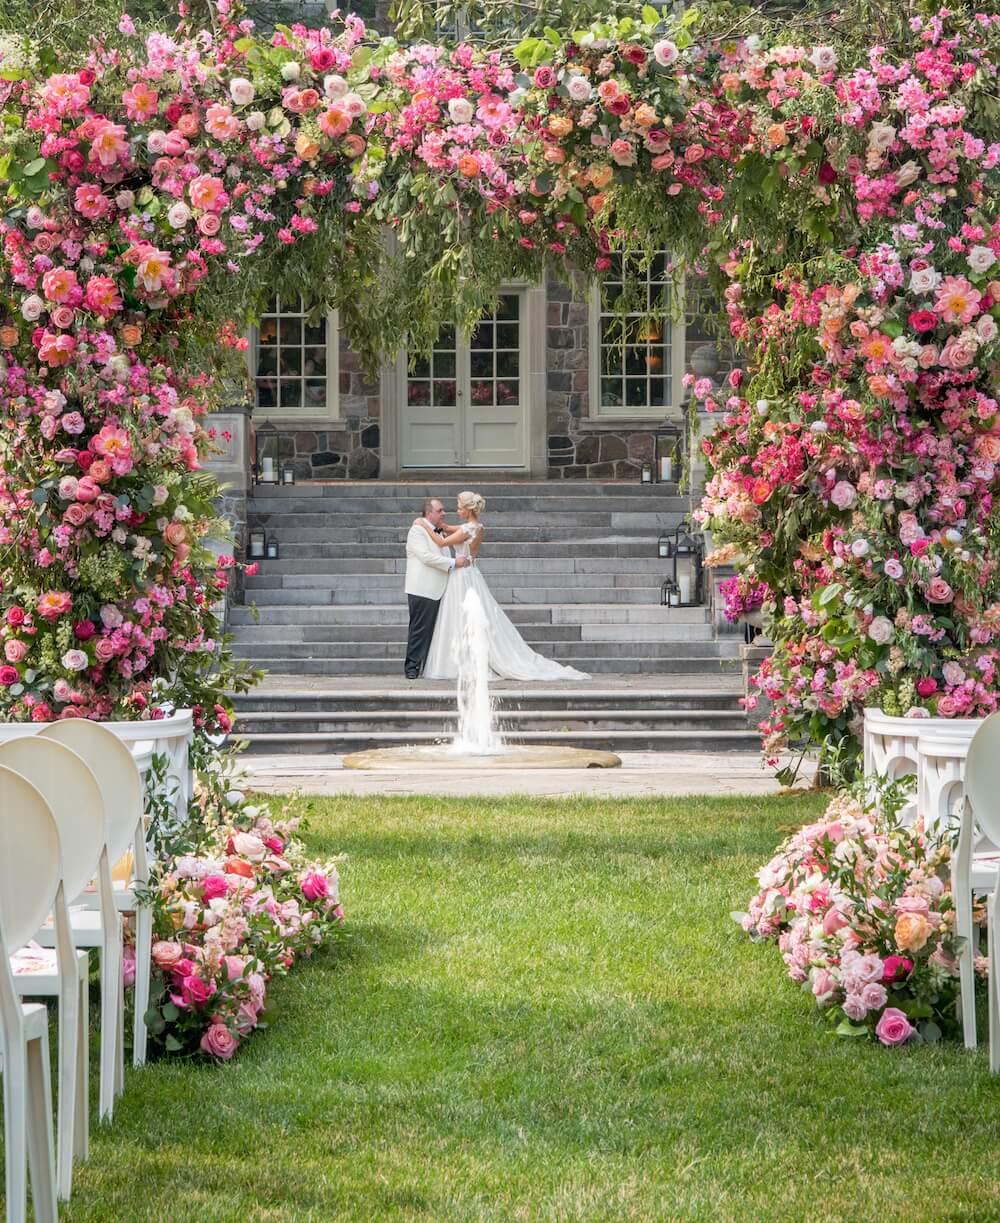 Wedding Decor Toronto Rachel A. Clingen Wedding